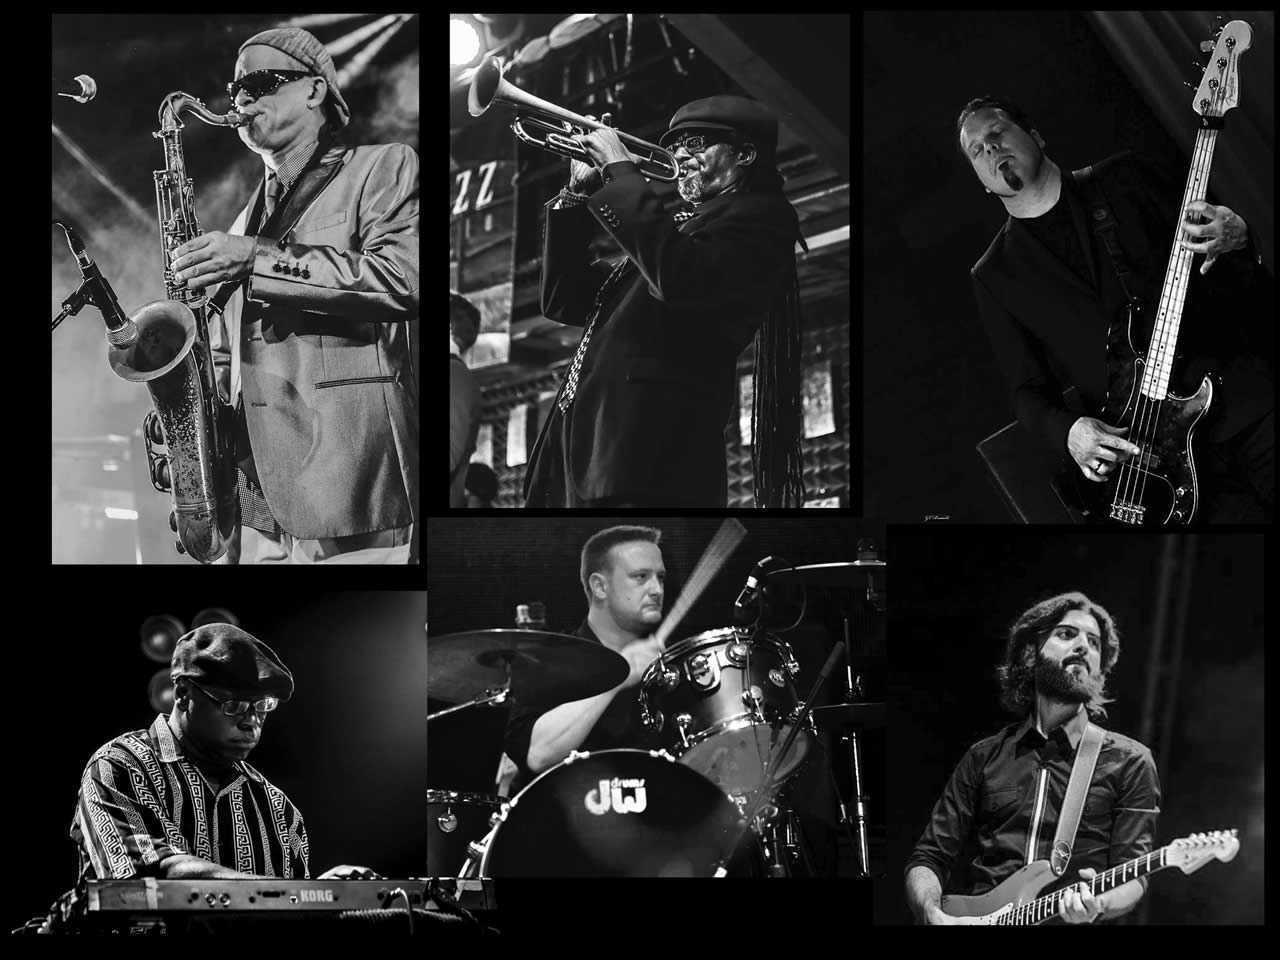 New york jazz lounge - take 5 №96784000 - прослушать музыку бесплатно, быстрый поиск музыки, онлайн радио, cкачать mp3 бесплатно, онлайн mp3 - dydka.com